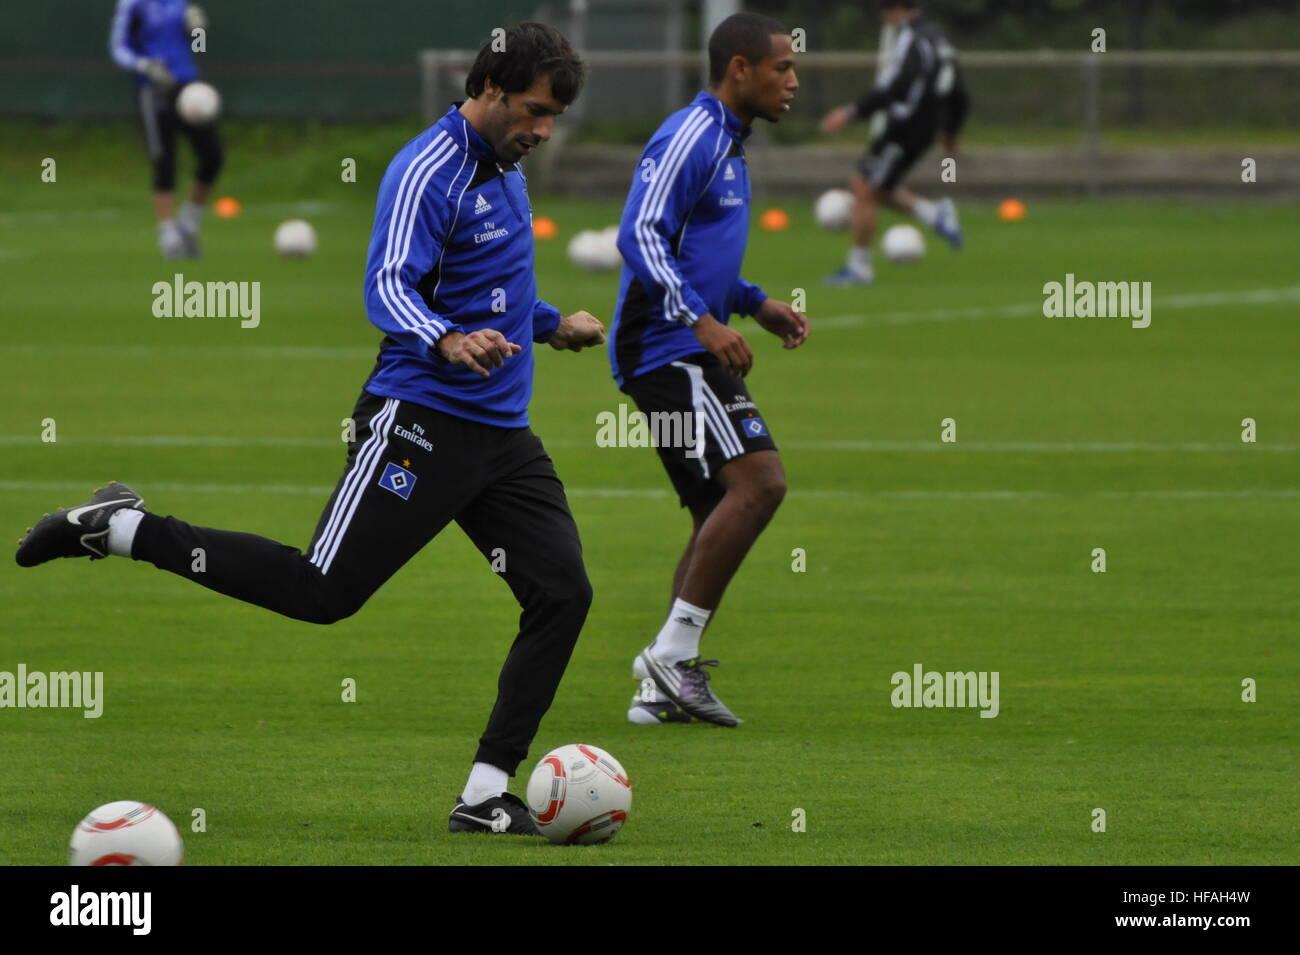 HSV-Training, Ruud van Nistelrooy, Imtech-Arena, Hamburg, Deutschland. Editorial use only. - Stock Image